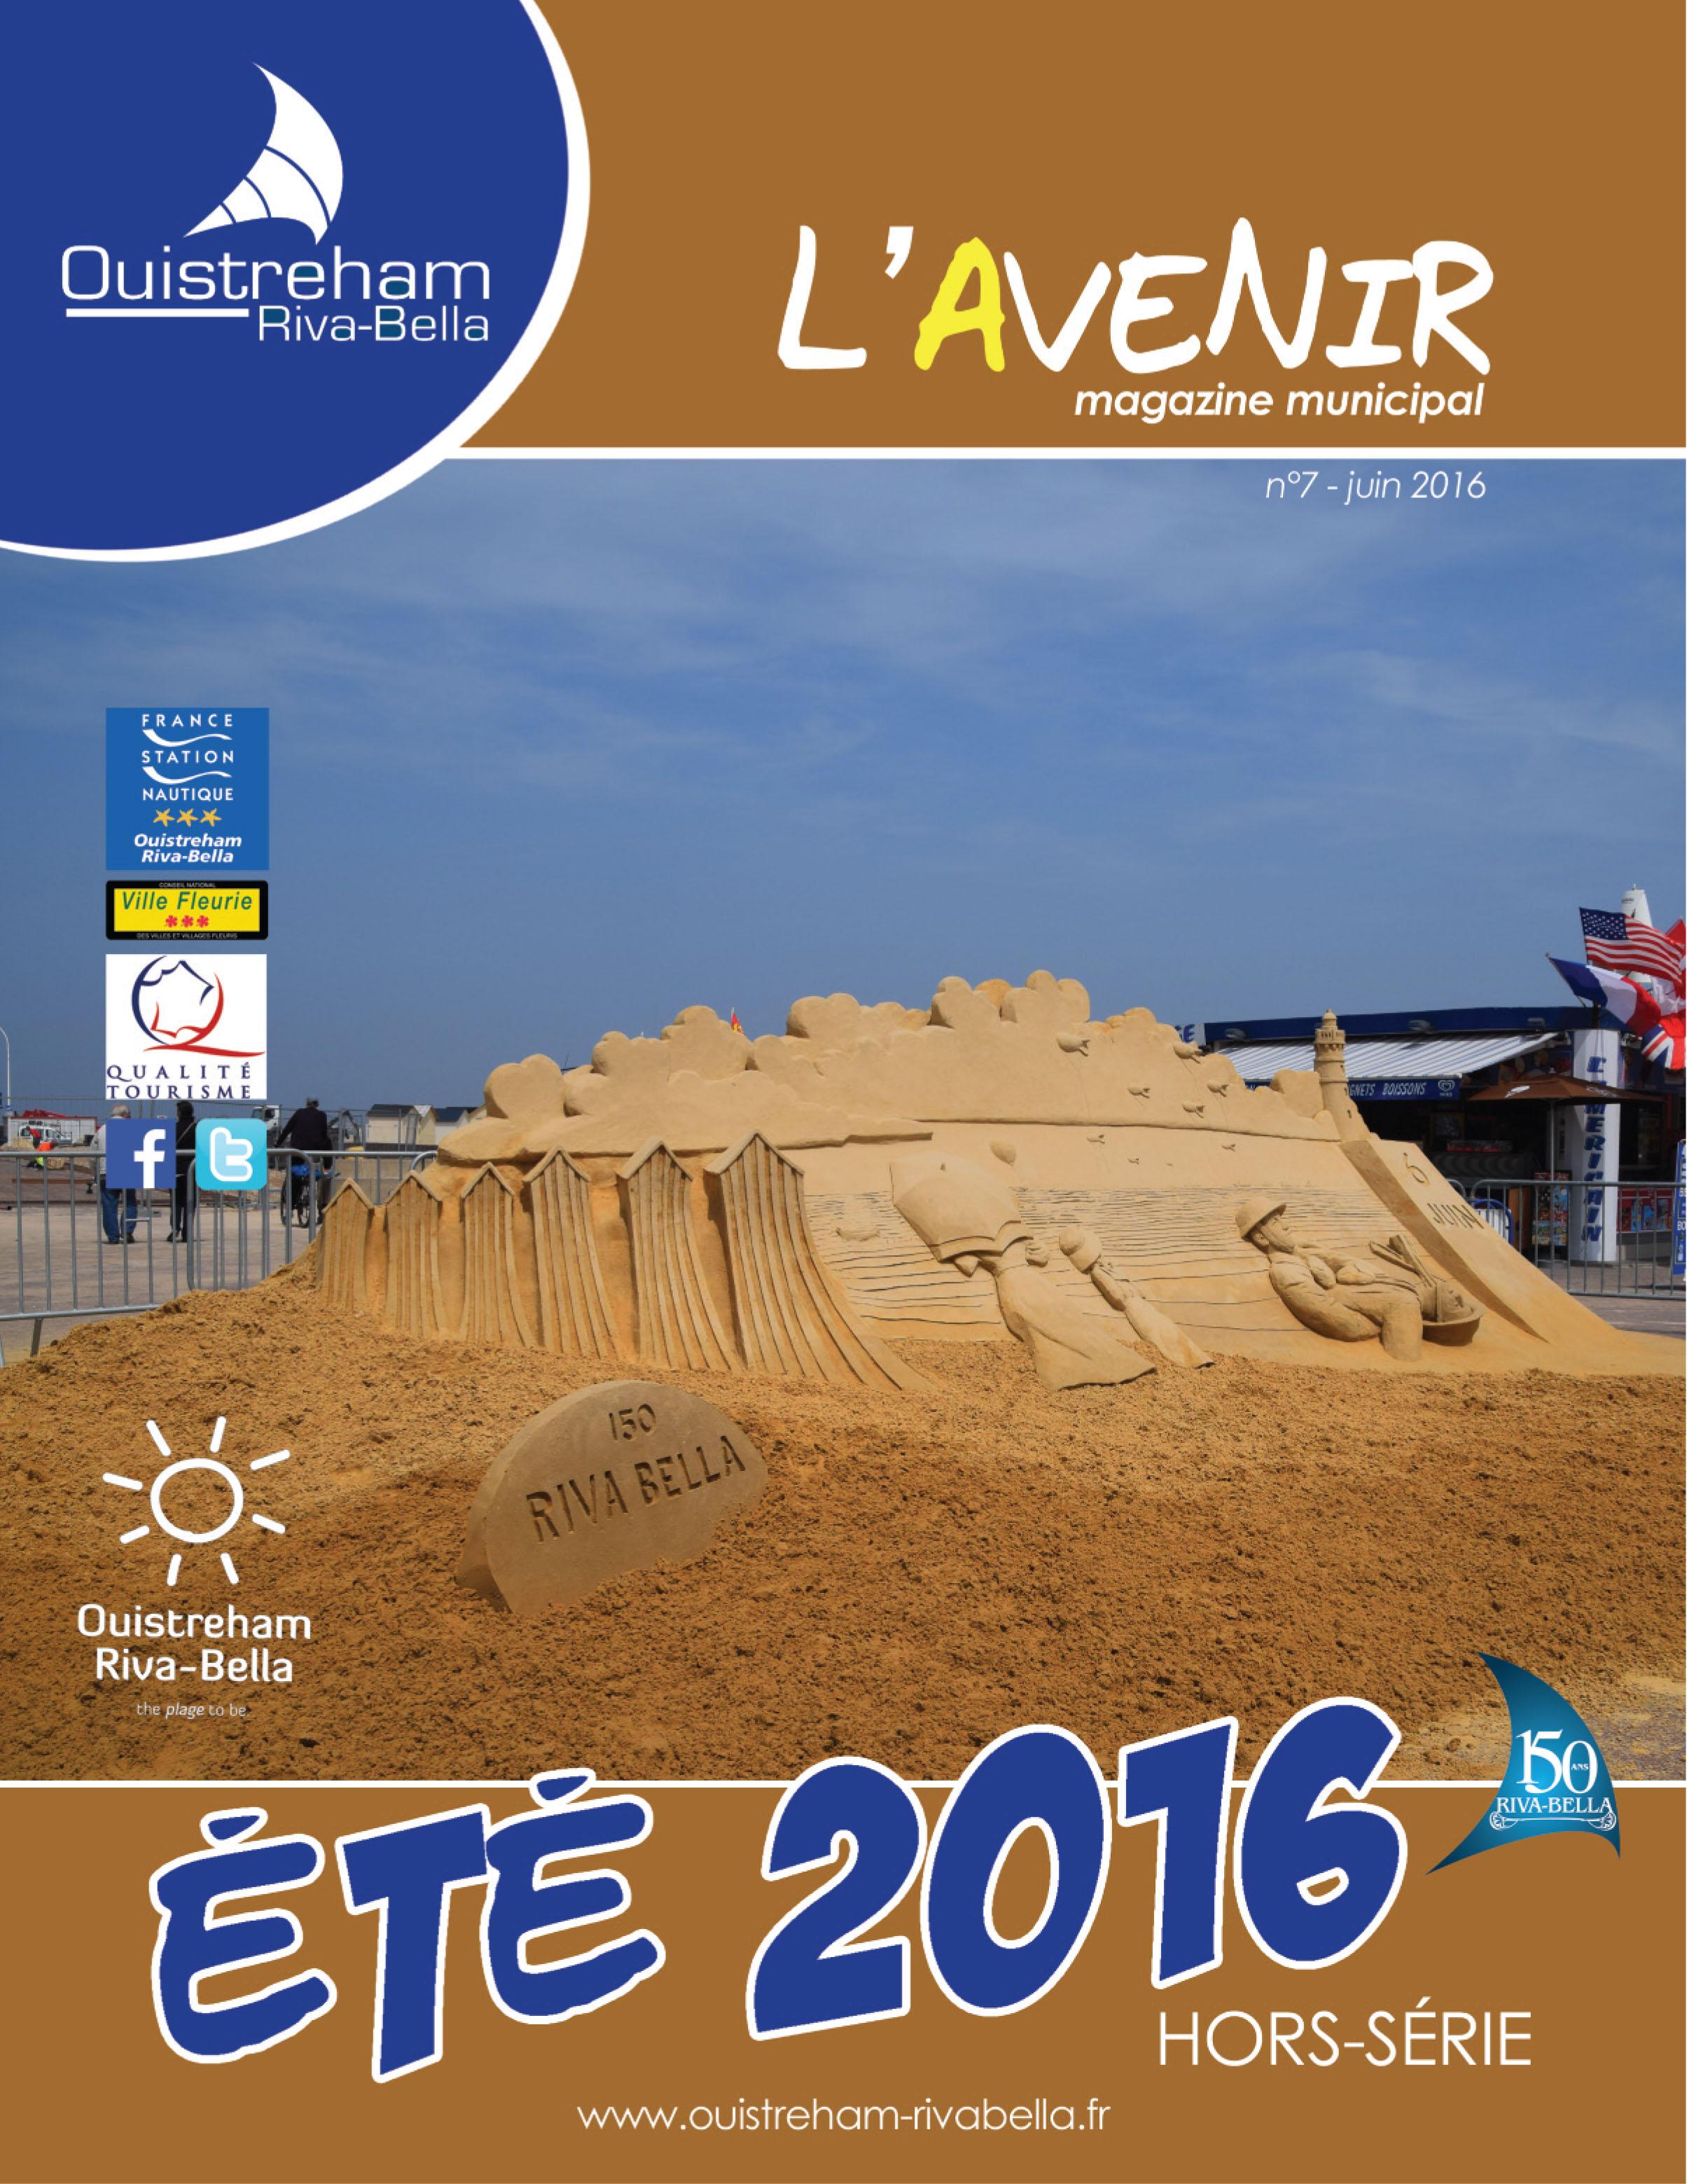 Magazine municipal - L'Avenir n°7 - Hors série - Ouistreham Riva-Bella - juin 2016